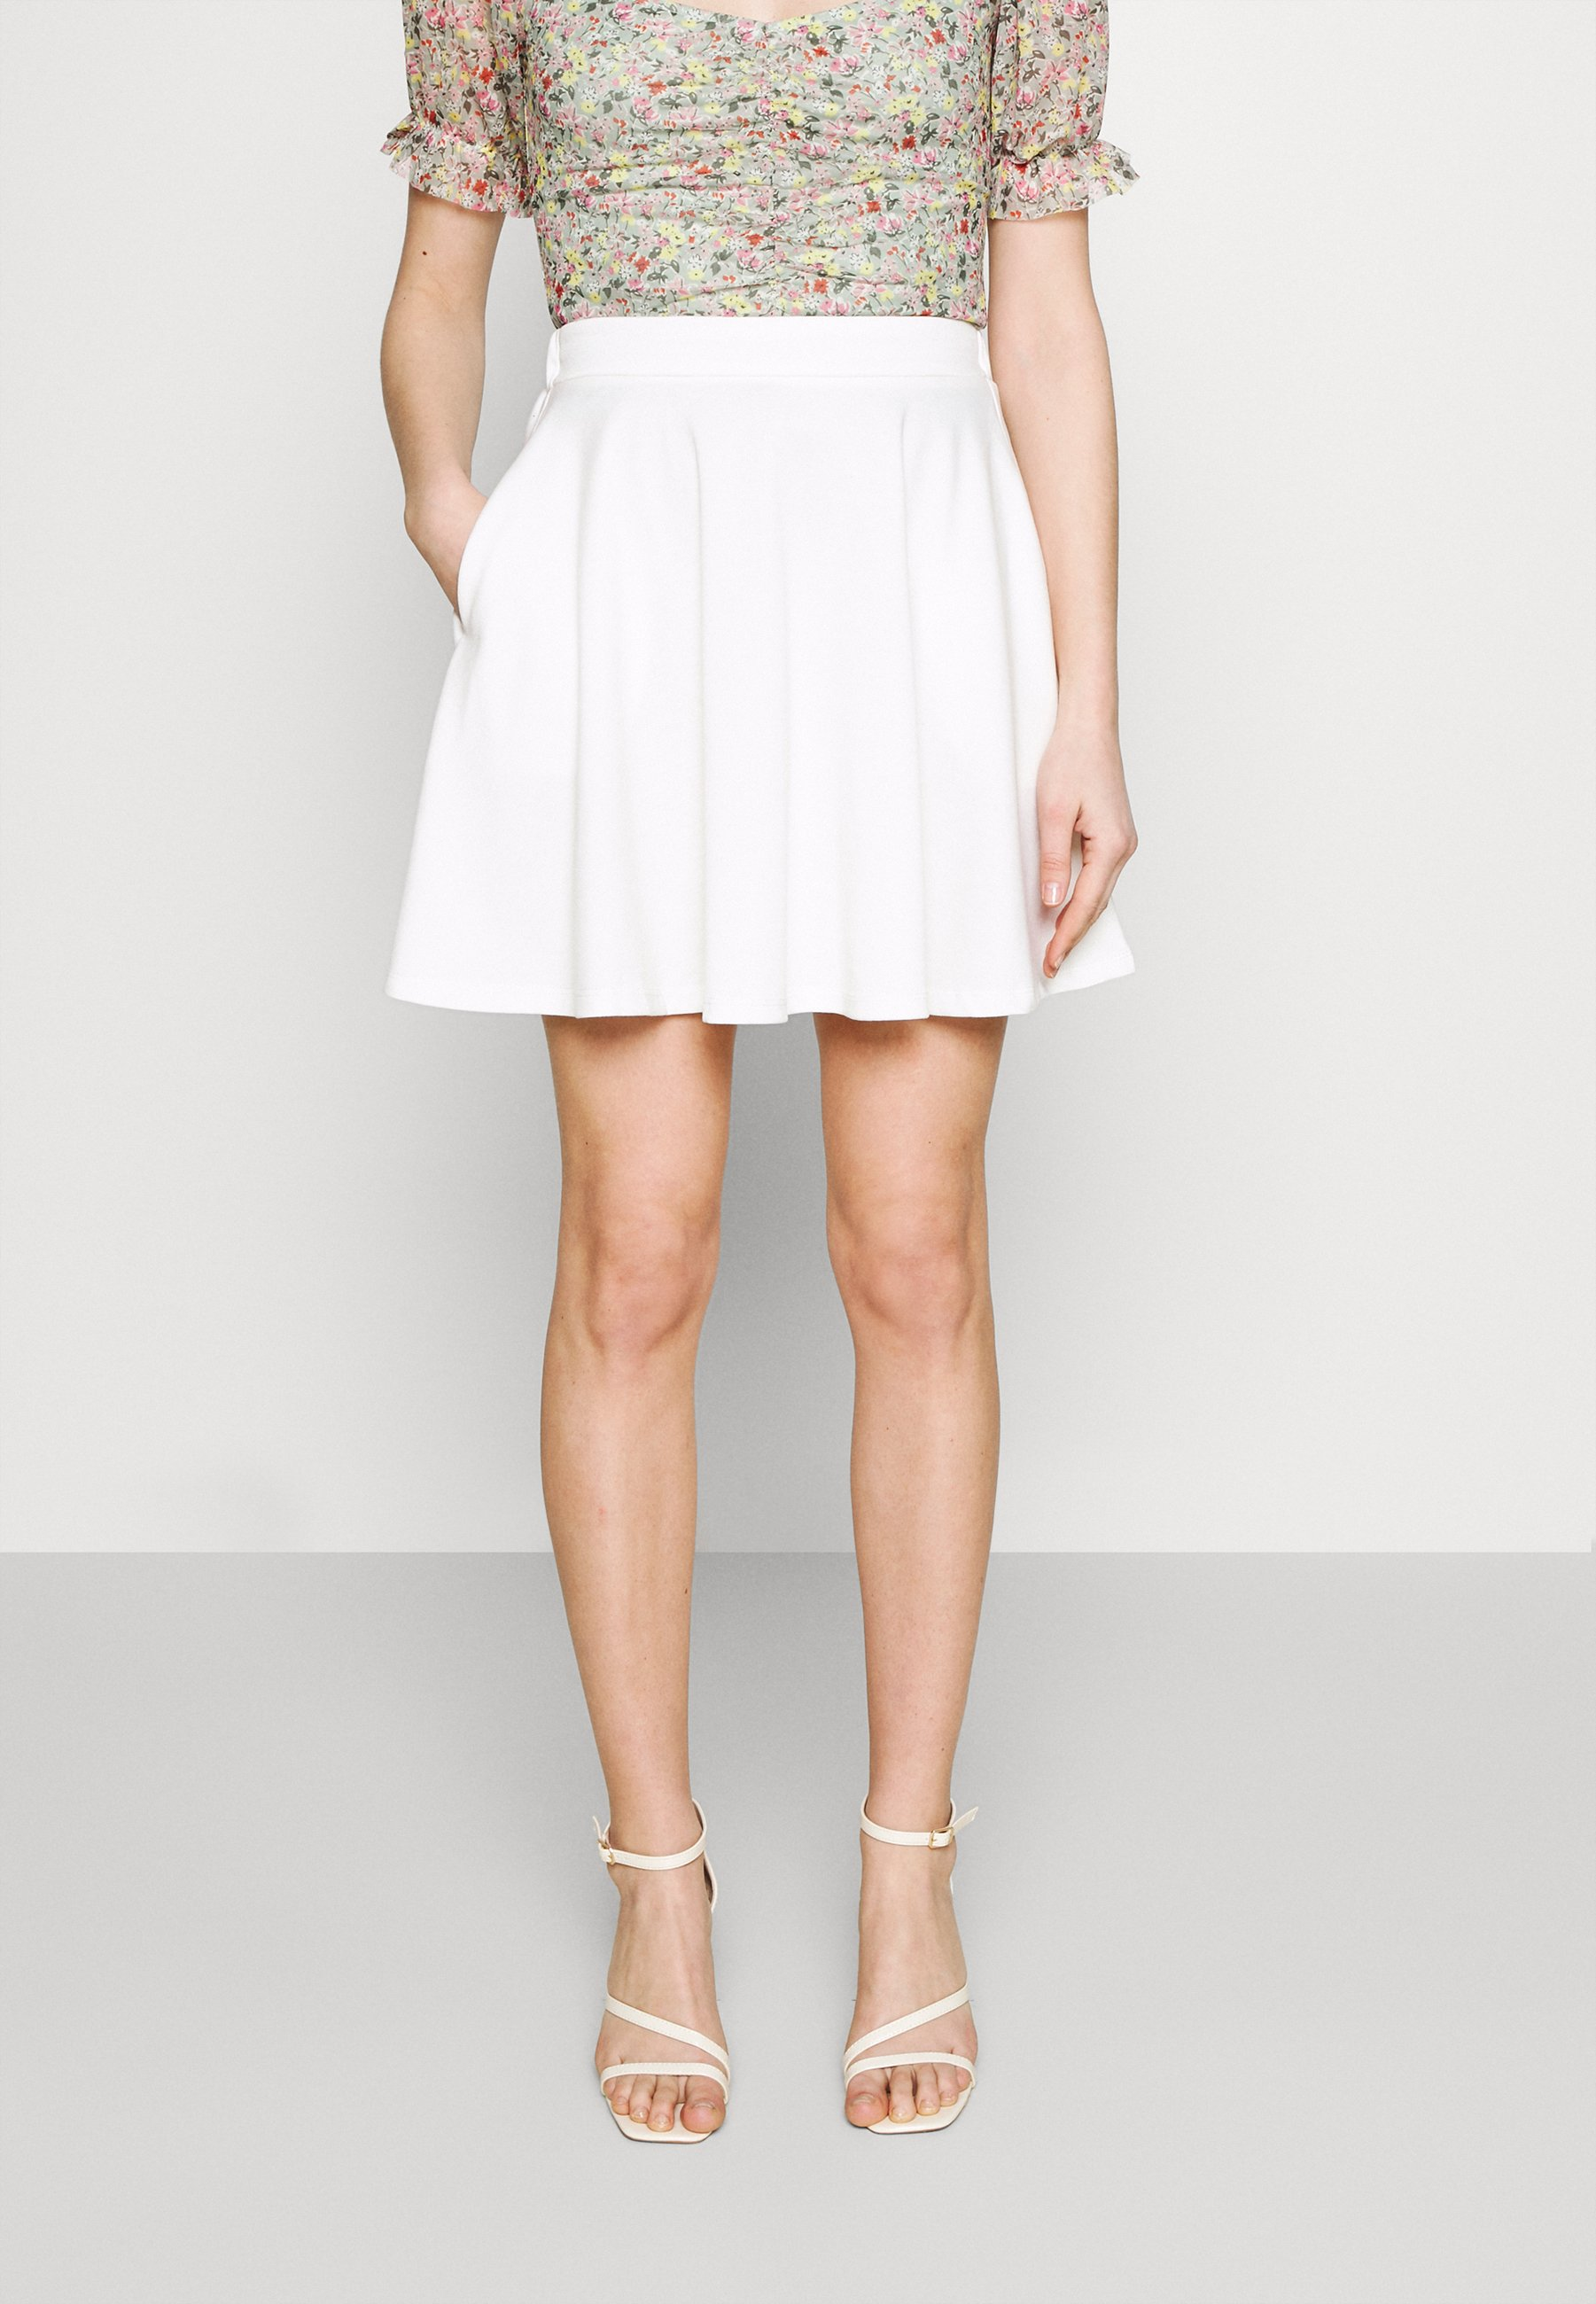 Femme VITINNY FLARED SKIRT - Minijupe